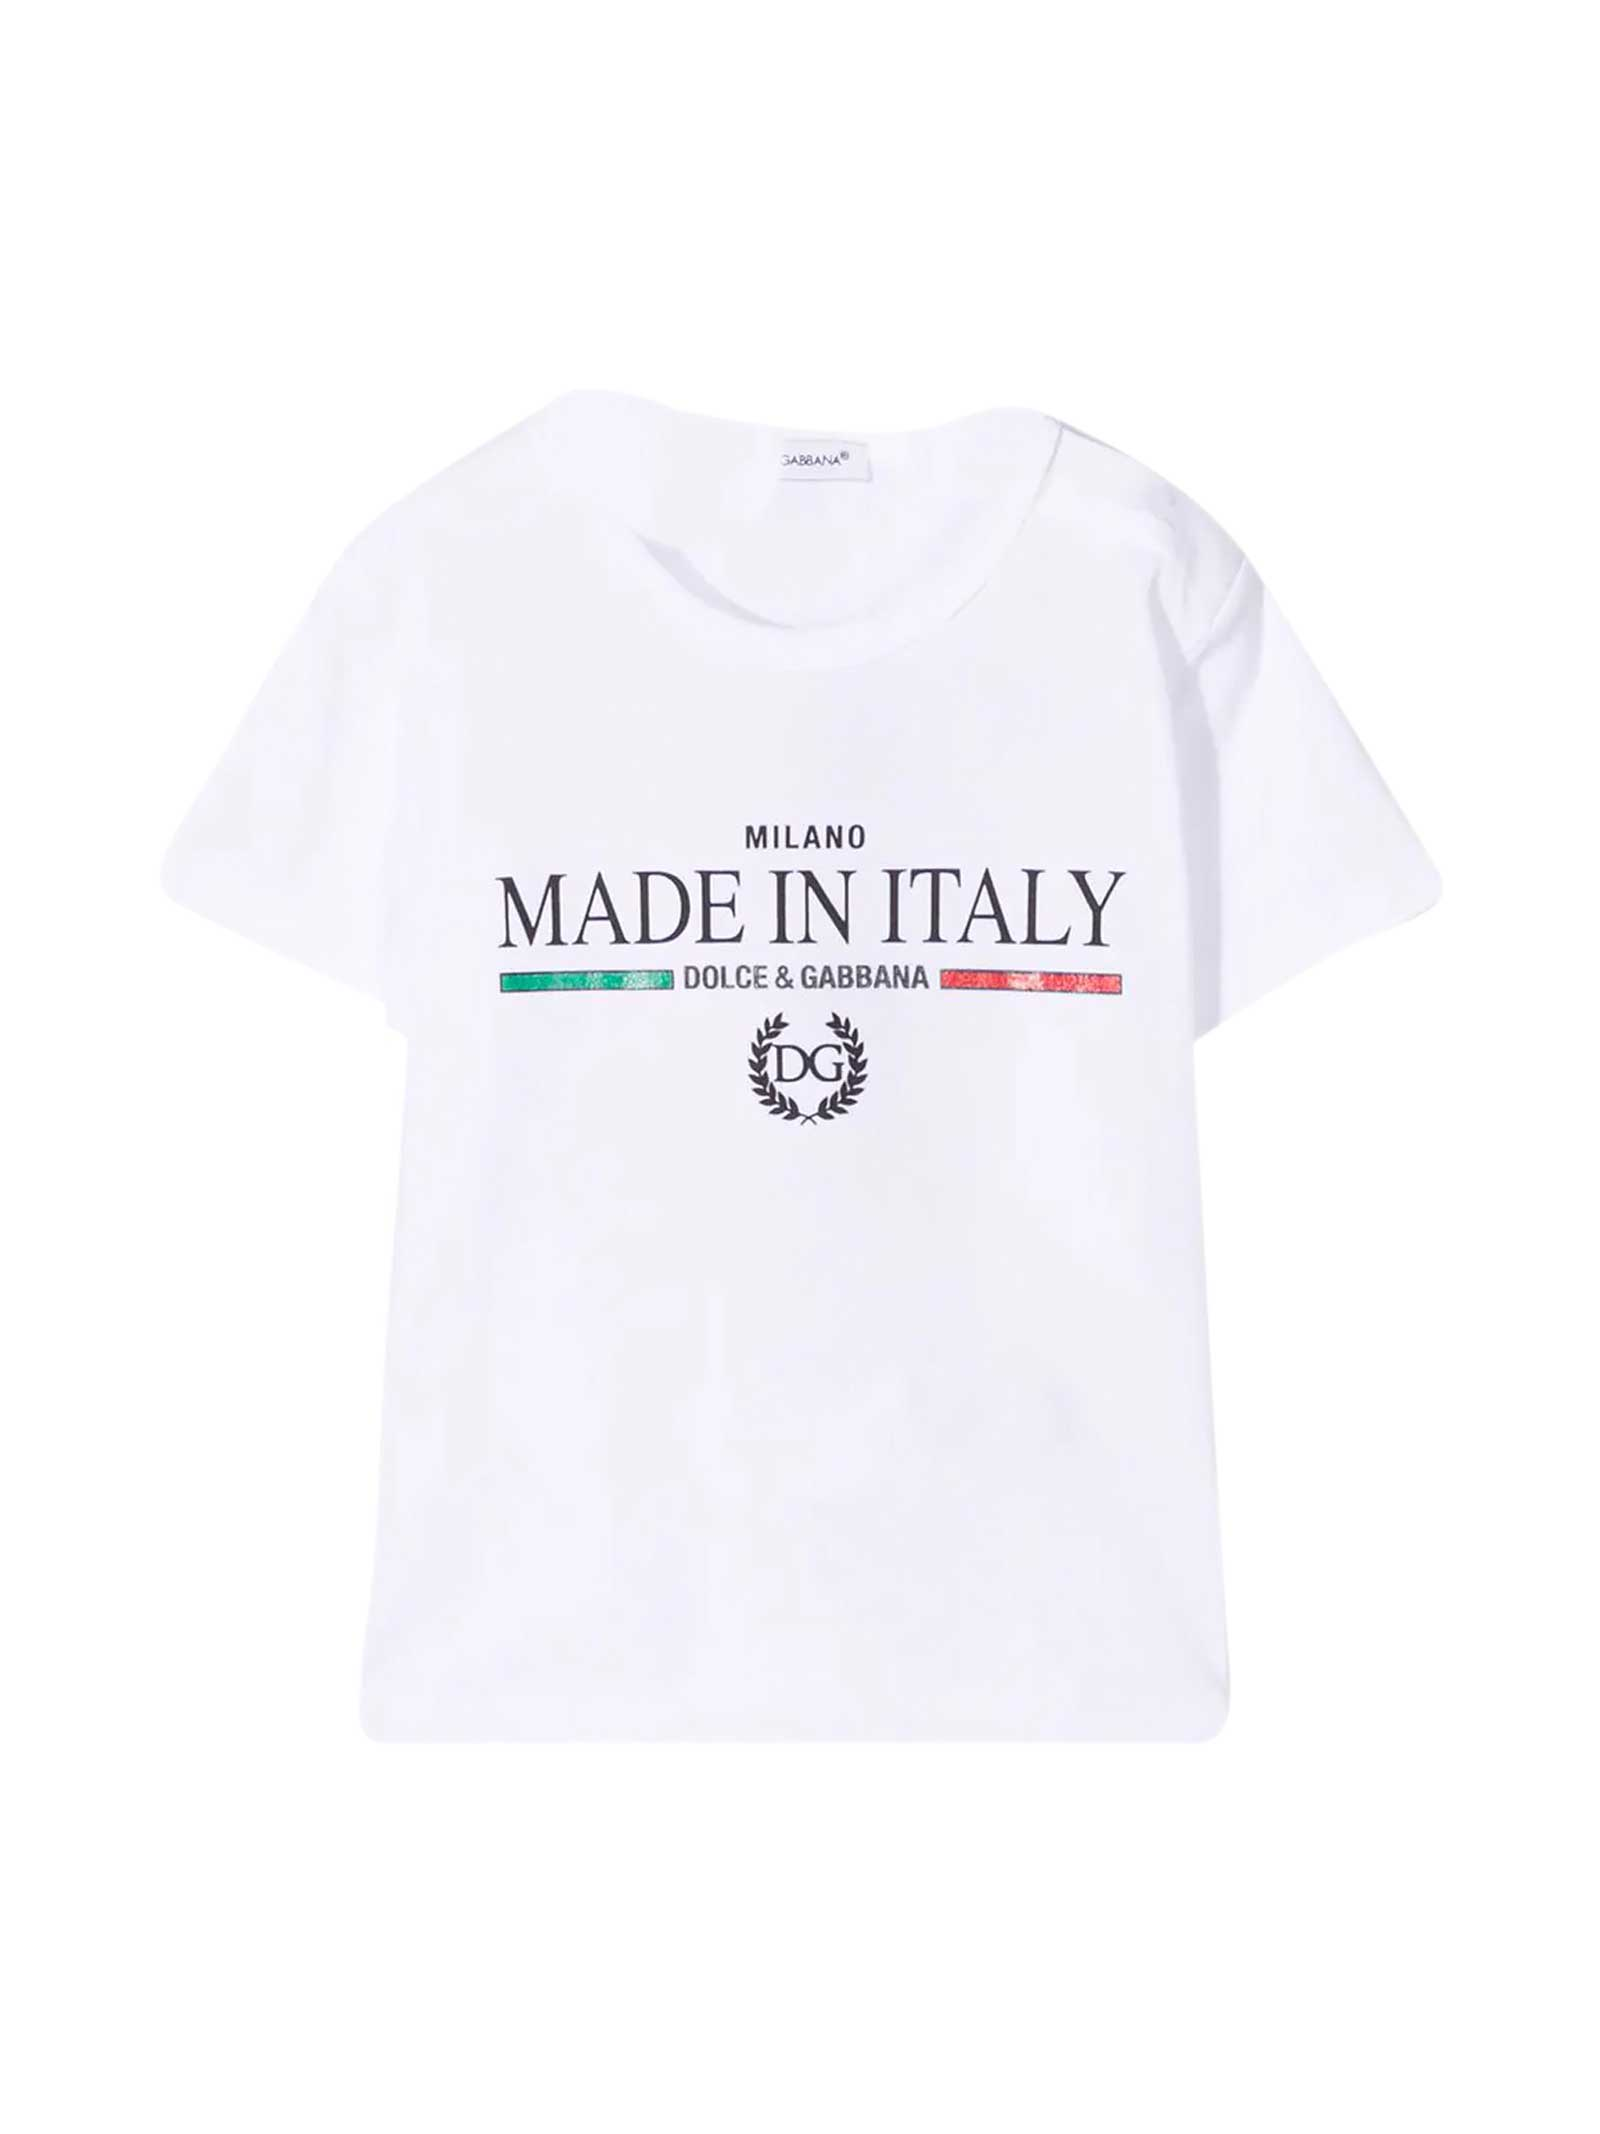 Dolce & Gabbana Tops WHITE T-SHIRT